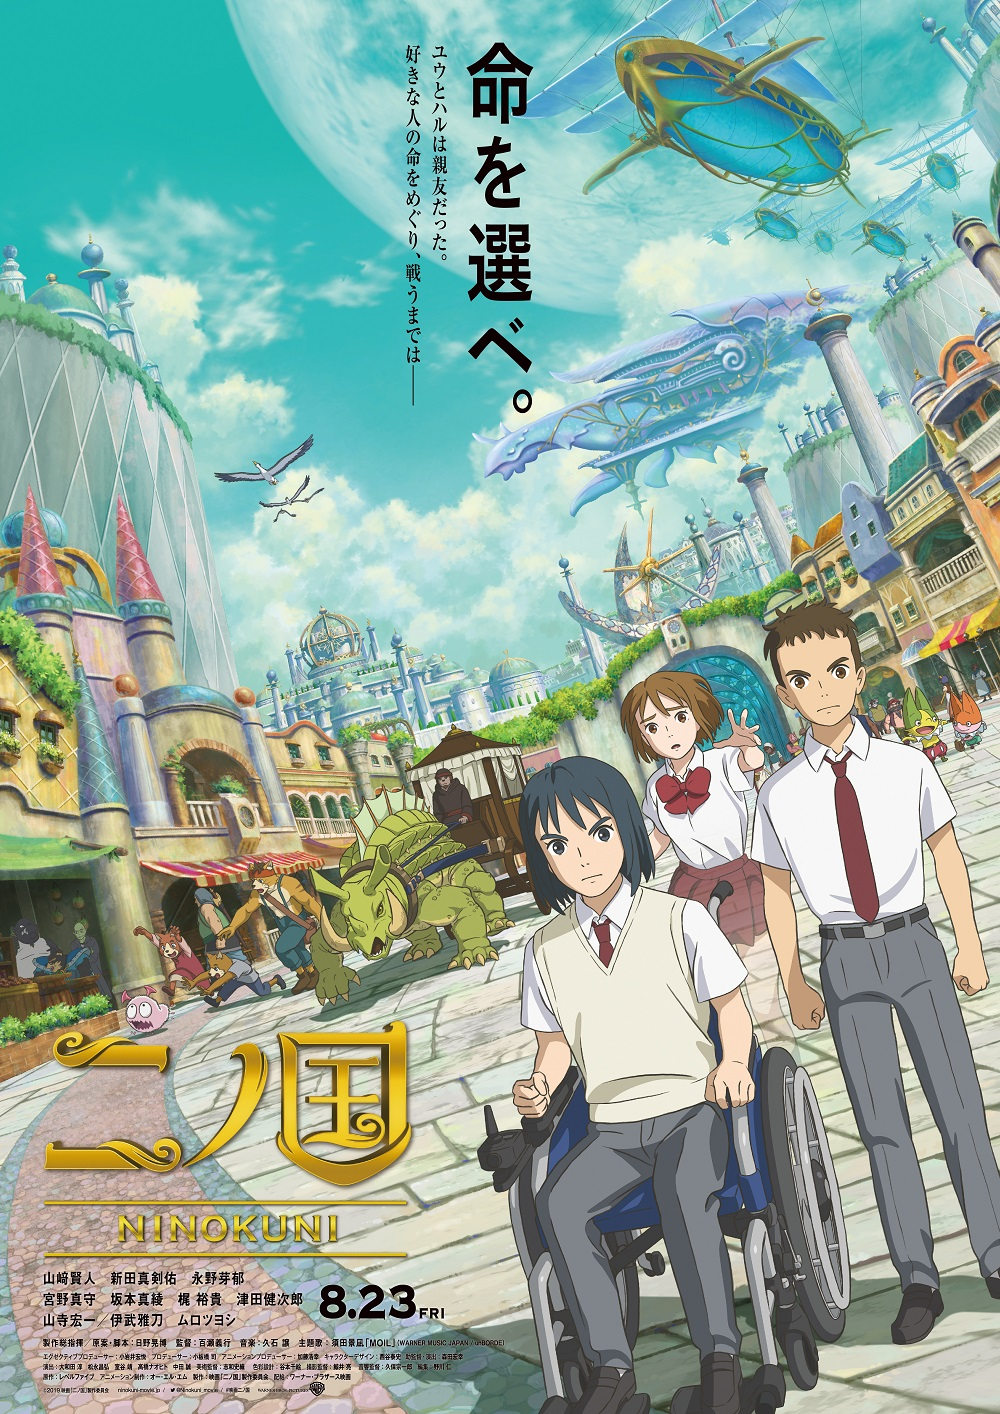 Ninokuni: the next binge-worthy animeseries?